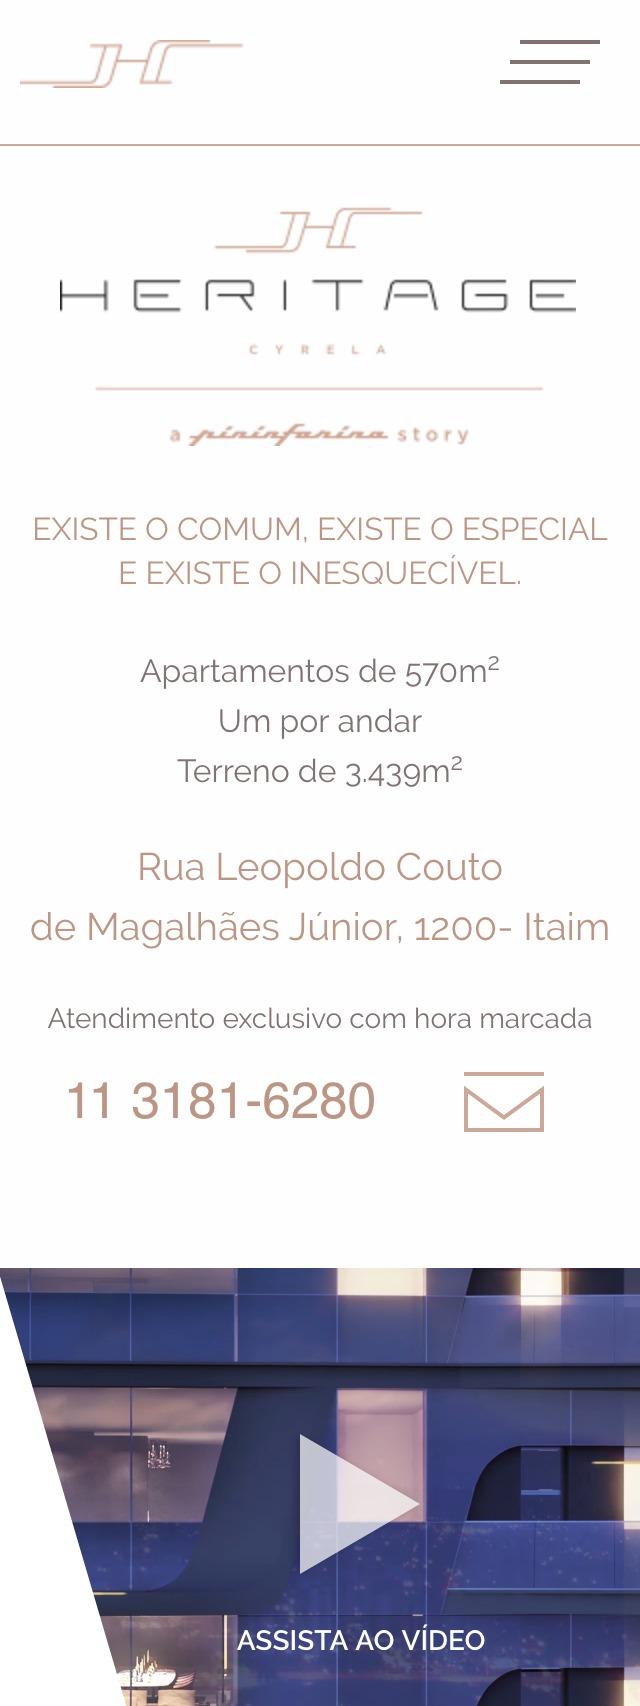 Heritage Cyrela - Apartamento de Luxo no Itaim Bibi - 023.jpg